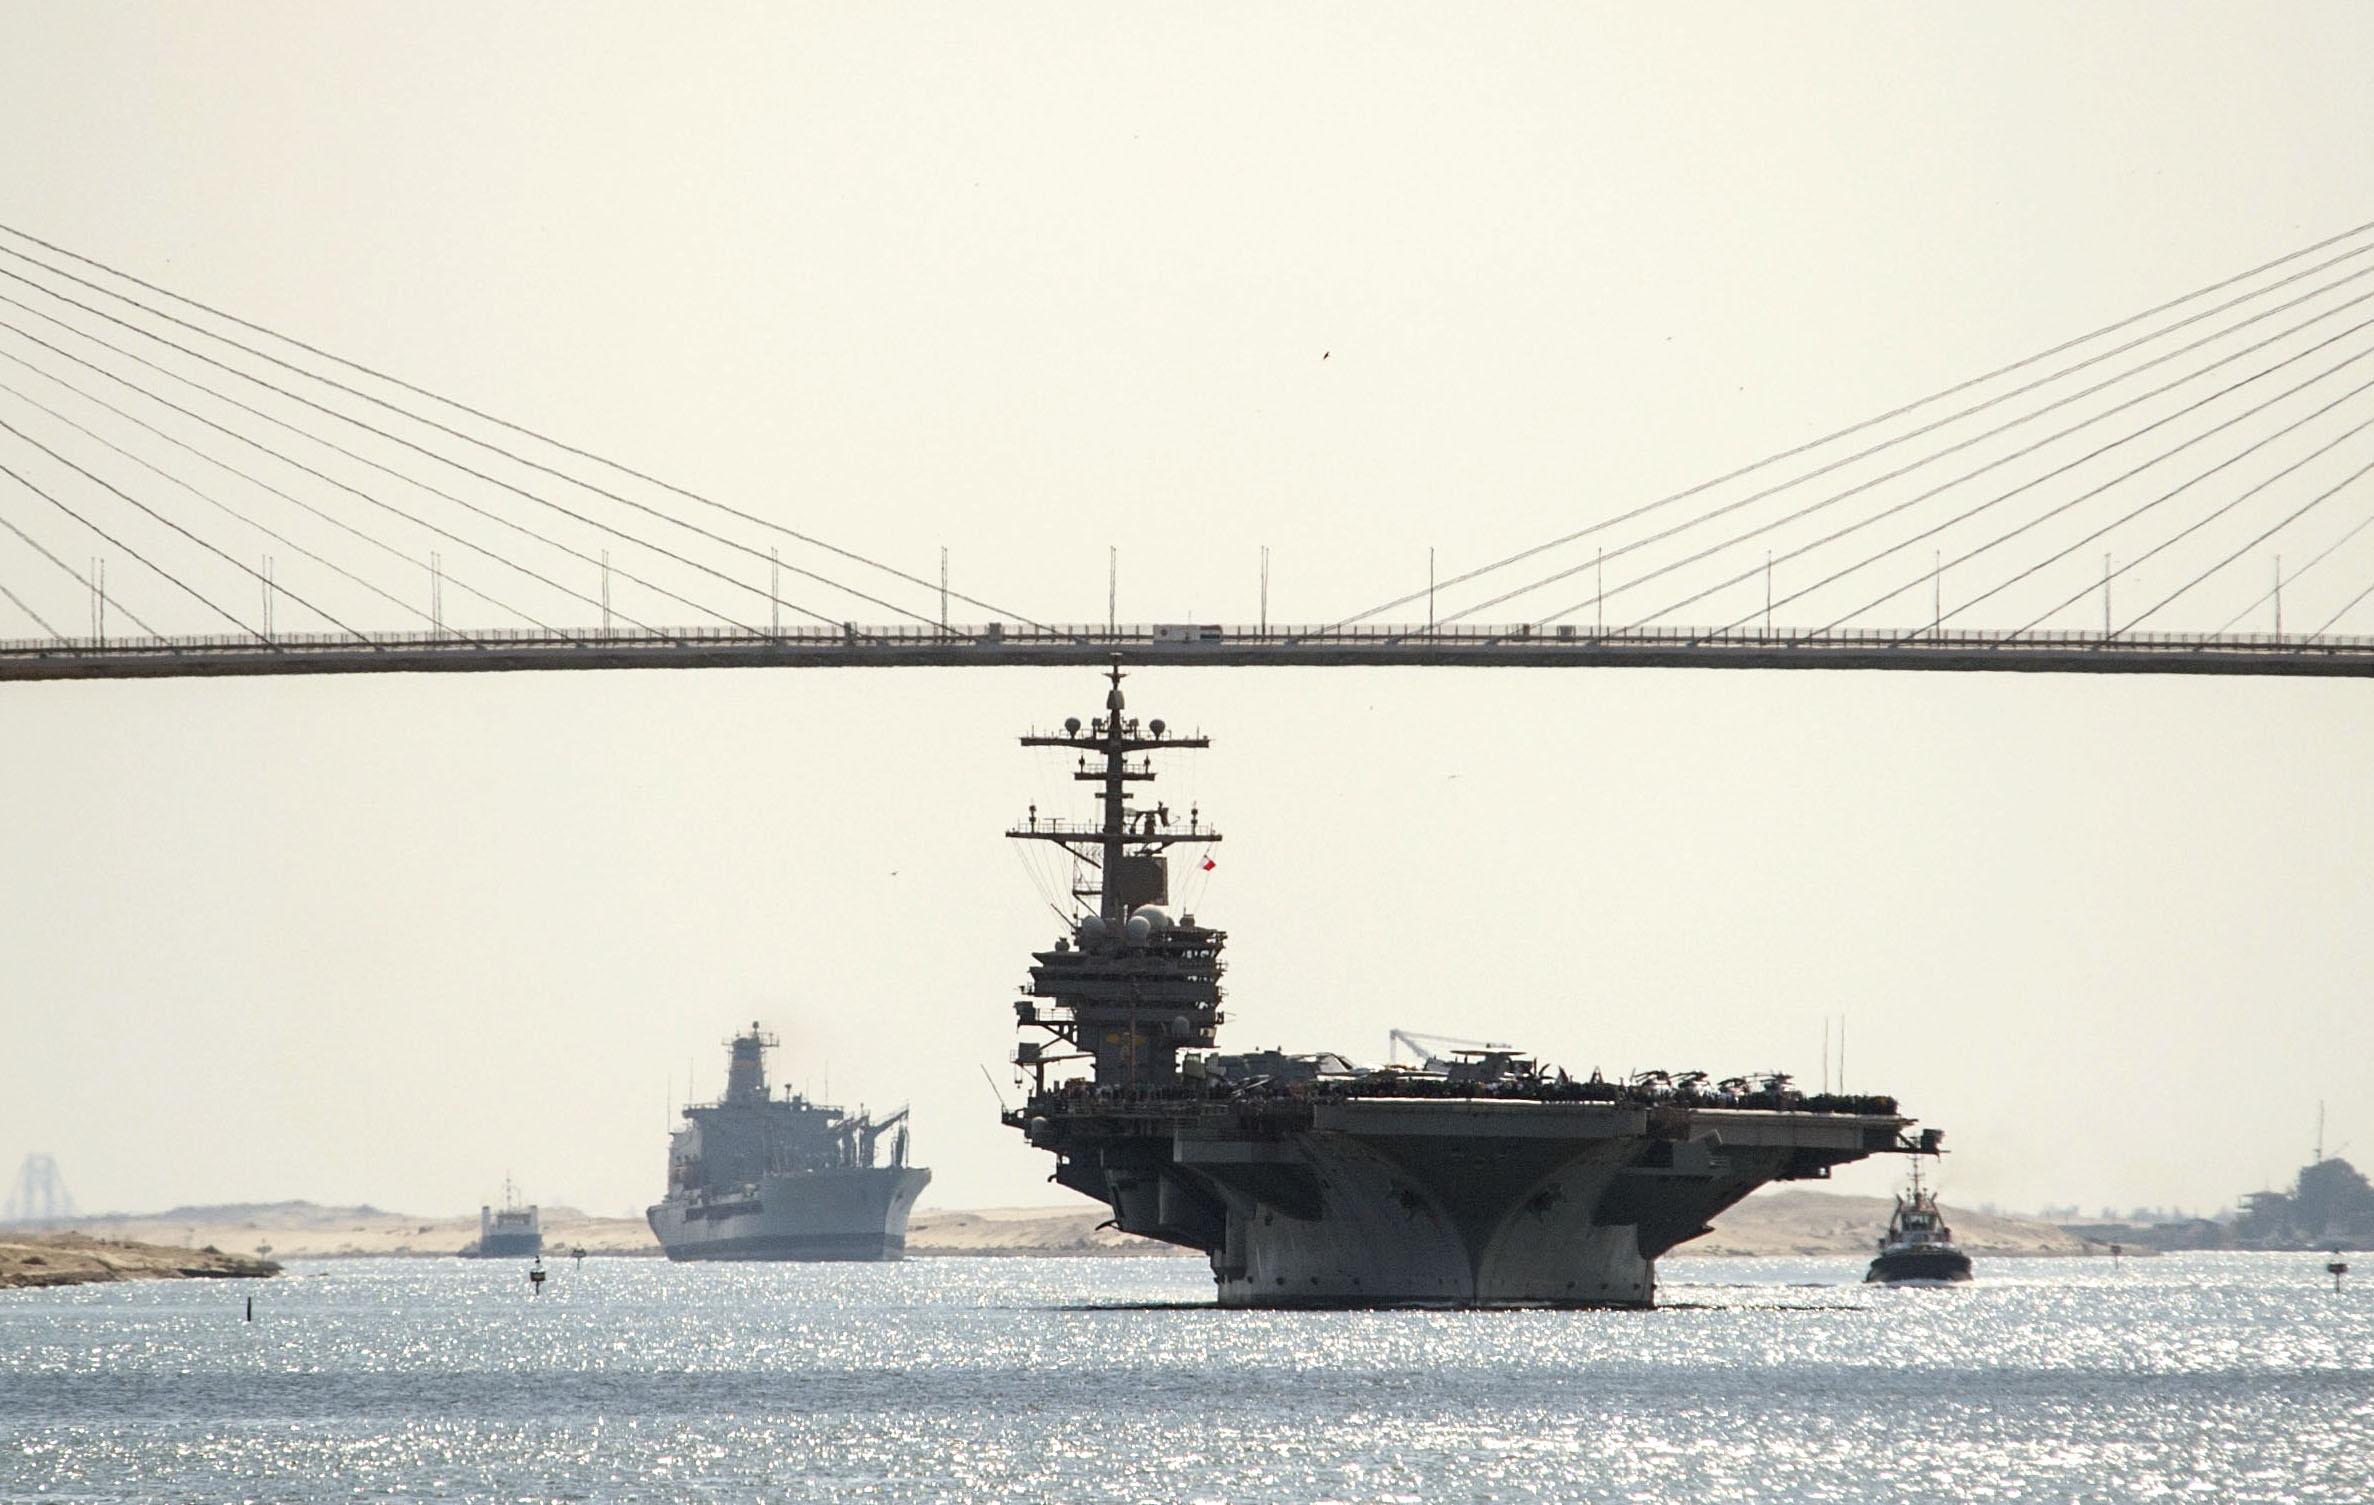 USS GEORGE H.W. BUSH CVN-77 Suez Kanal am 27.10.2014 Bild: U.S. Navy